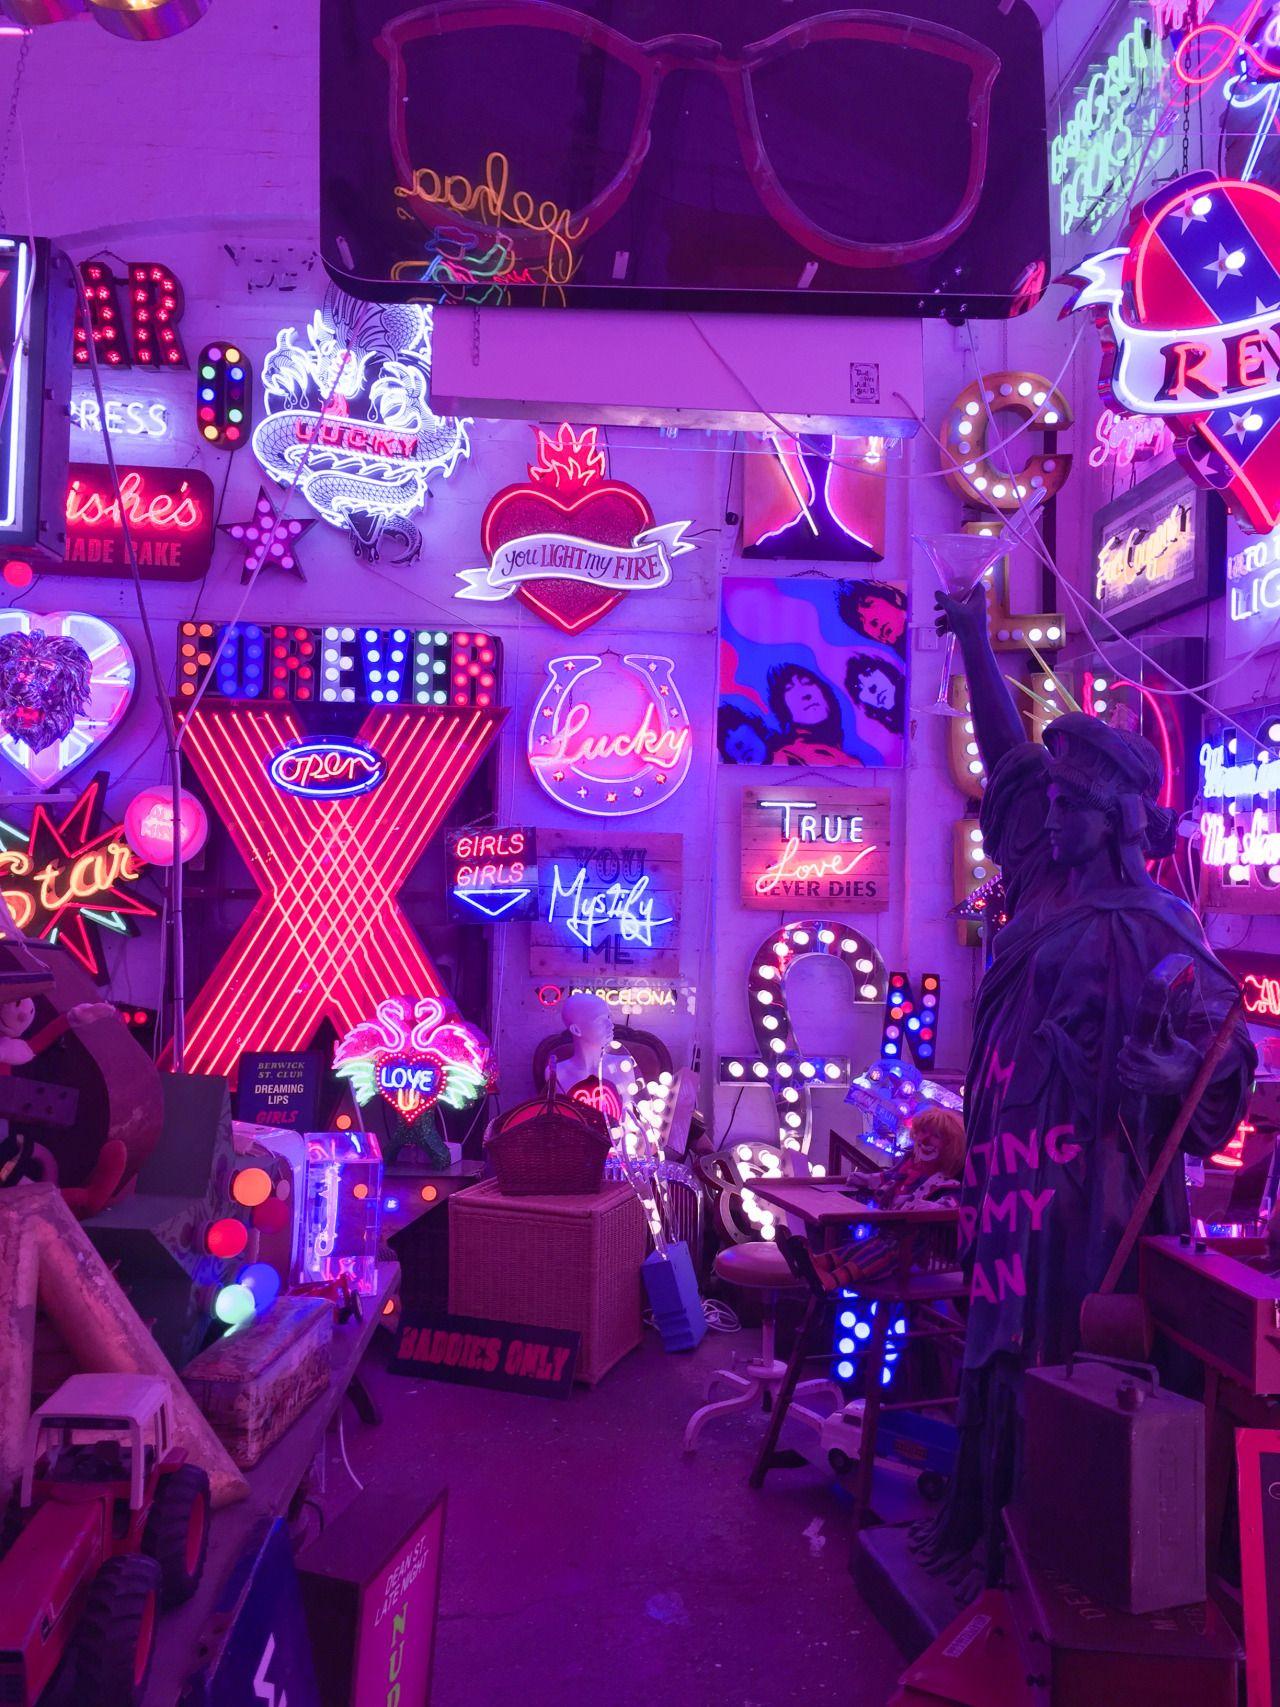 Neon Lights Aesthetic Wallpaper